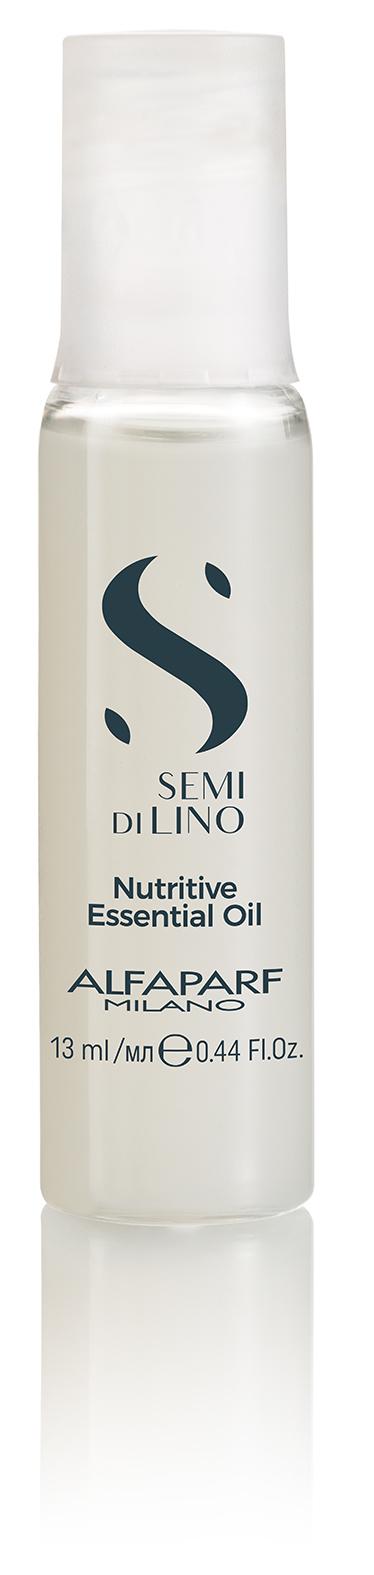 Масло увлажняющее для питания сухих волос SDL MOISTURE NUTRITIVE ESSENTIAL OIL, 6 ампул по 13 мл